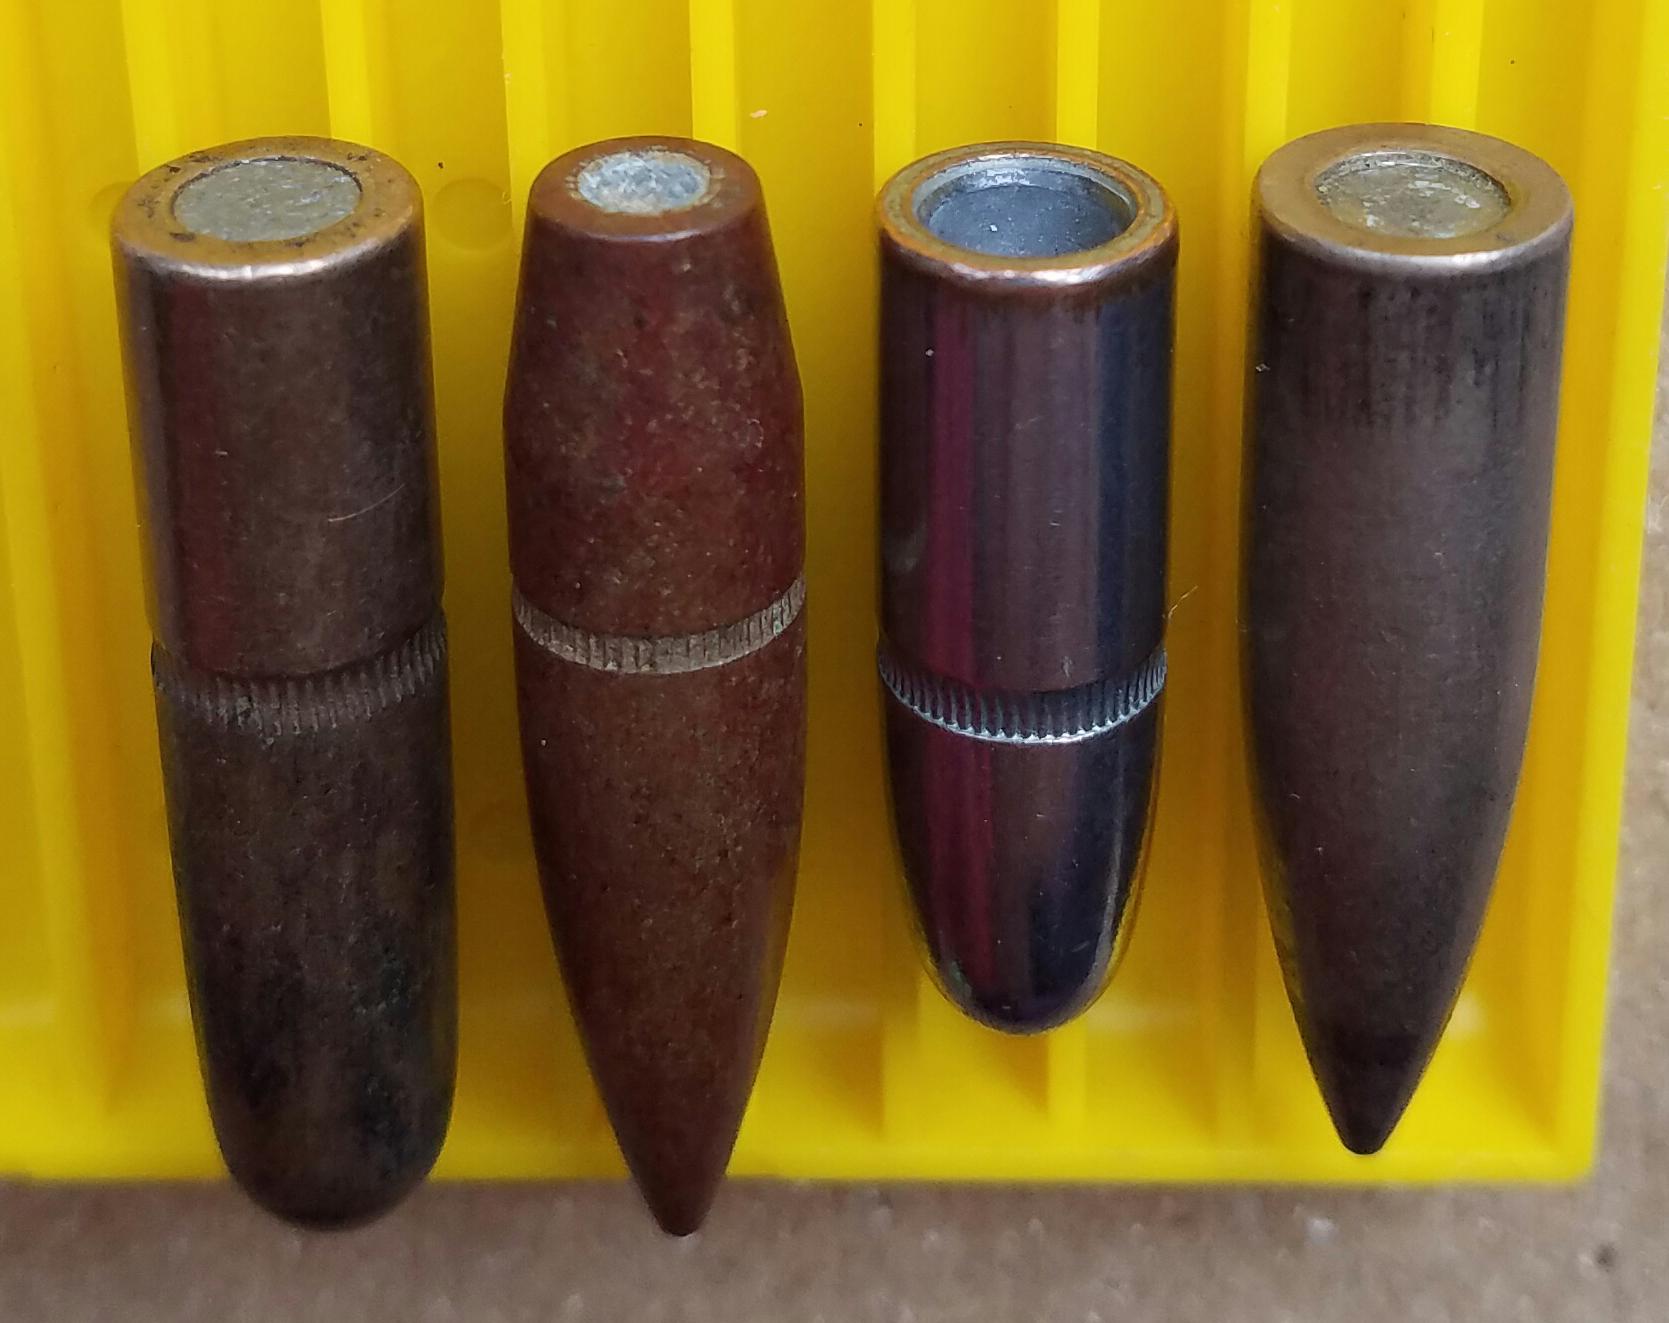 The Bullet Plastic Ring